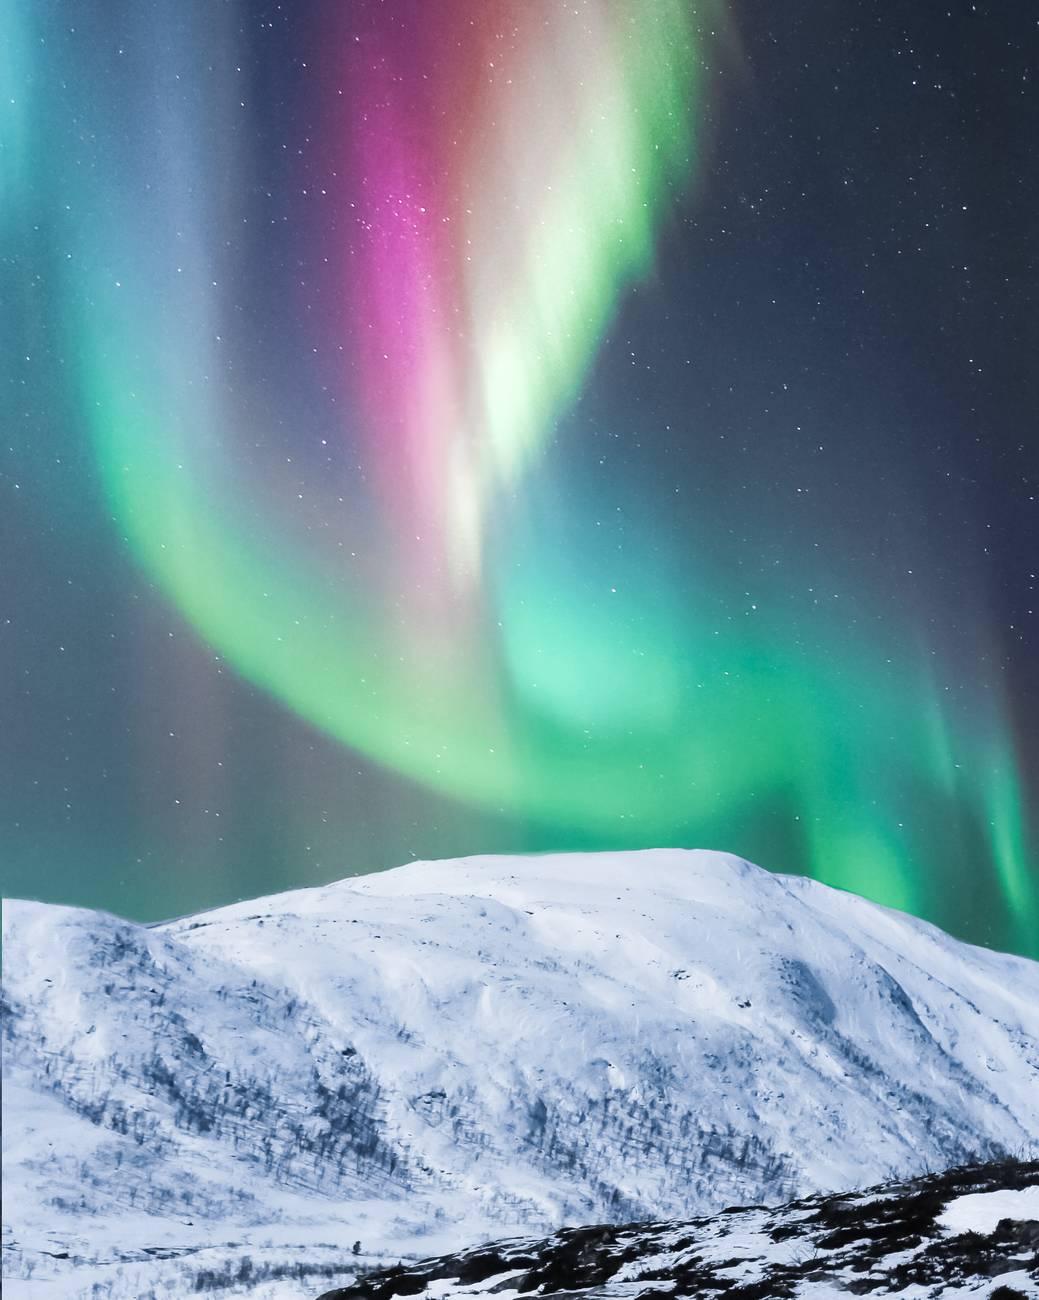 colorful polar lights over snowy mountain